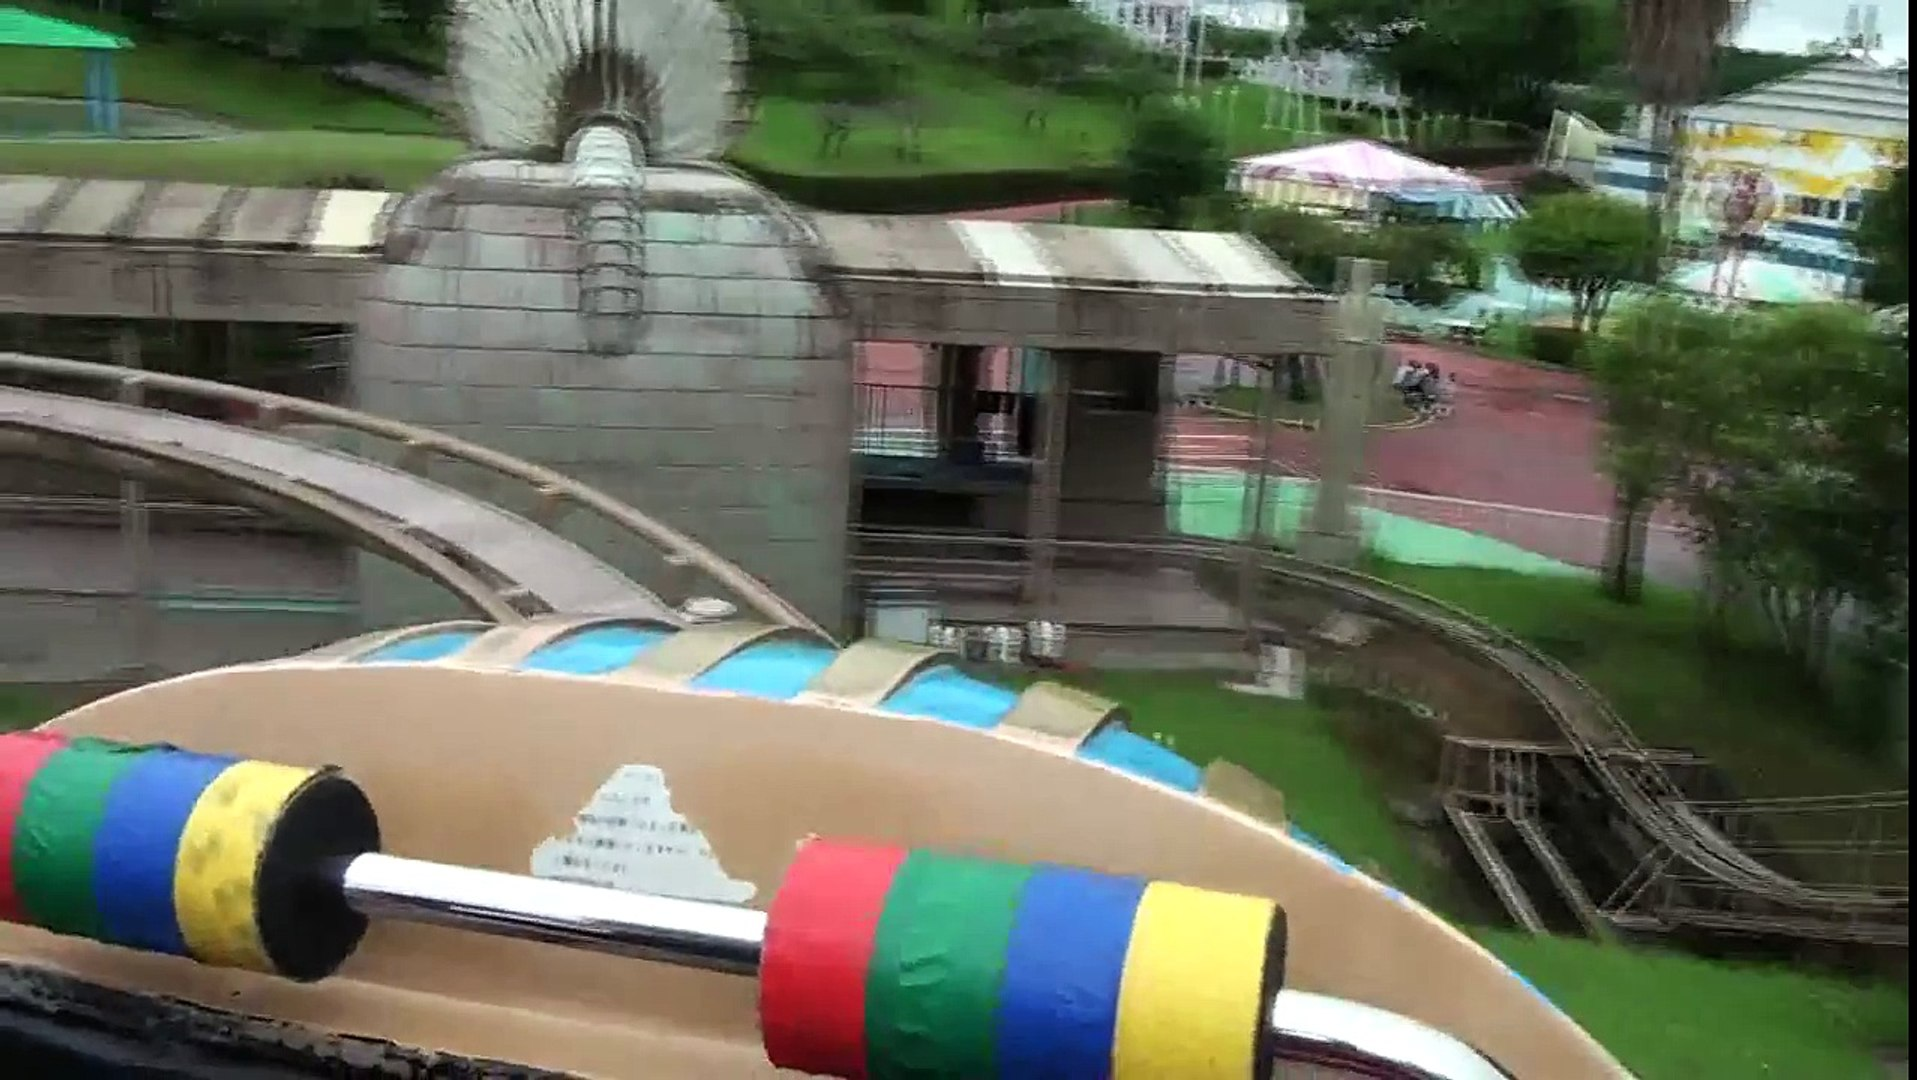 Sphinx Roller Coaster POV Kiddie Family Coaster Mitsui Greenland Japan HD 1080